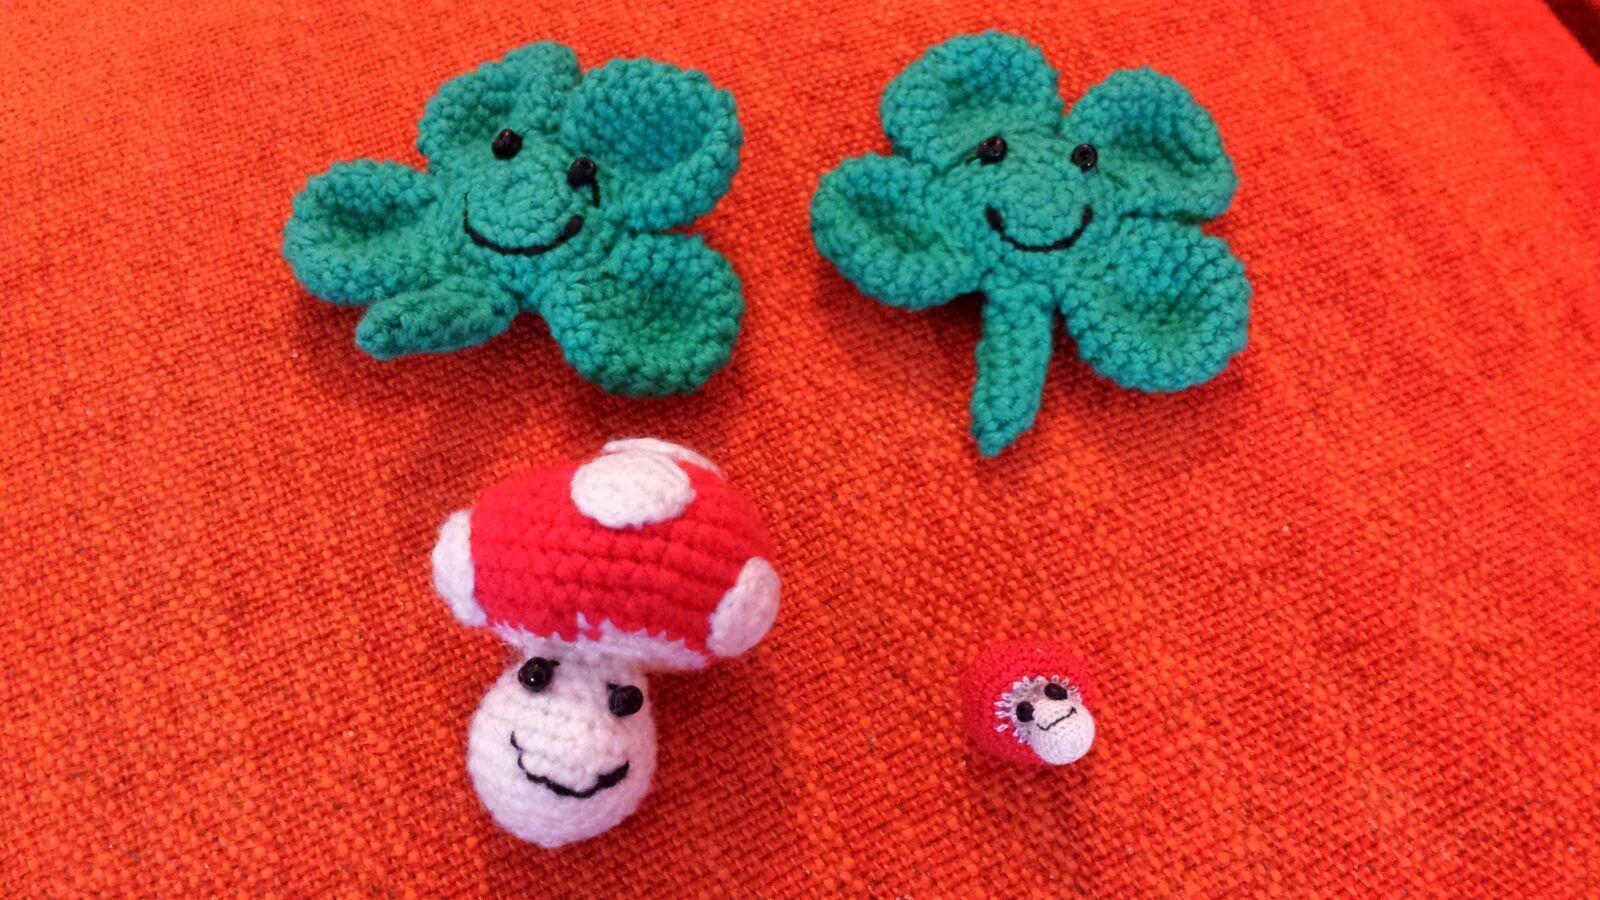 Some New Crochet Projects Crochet Haken Luckycharms